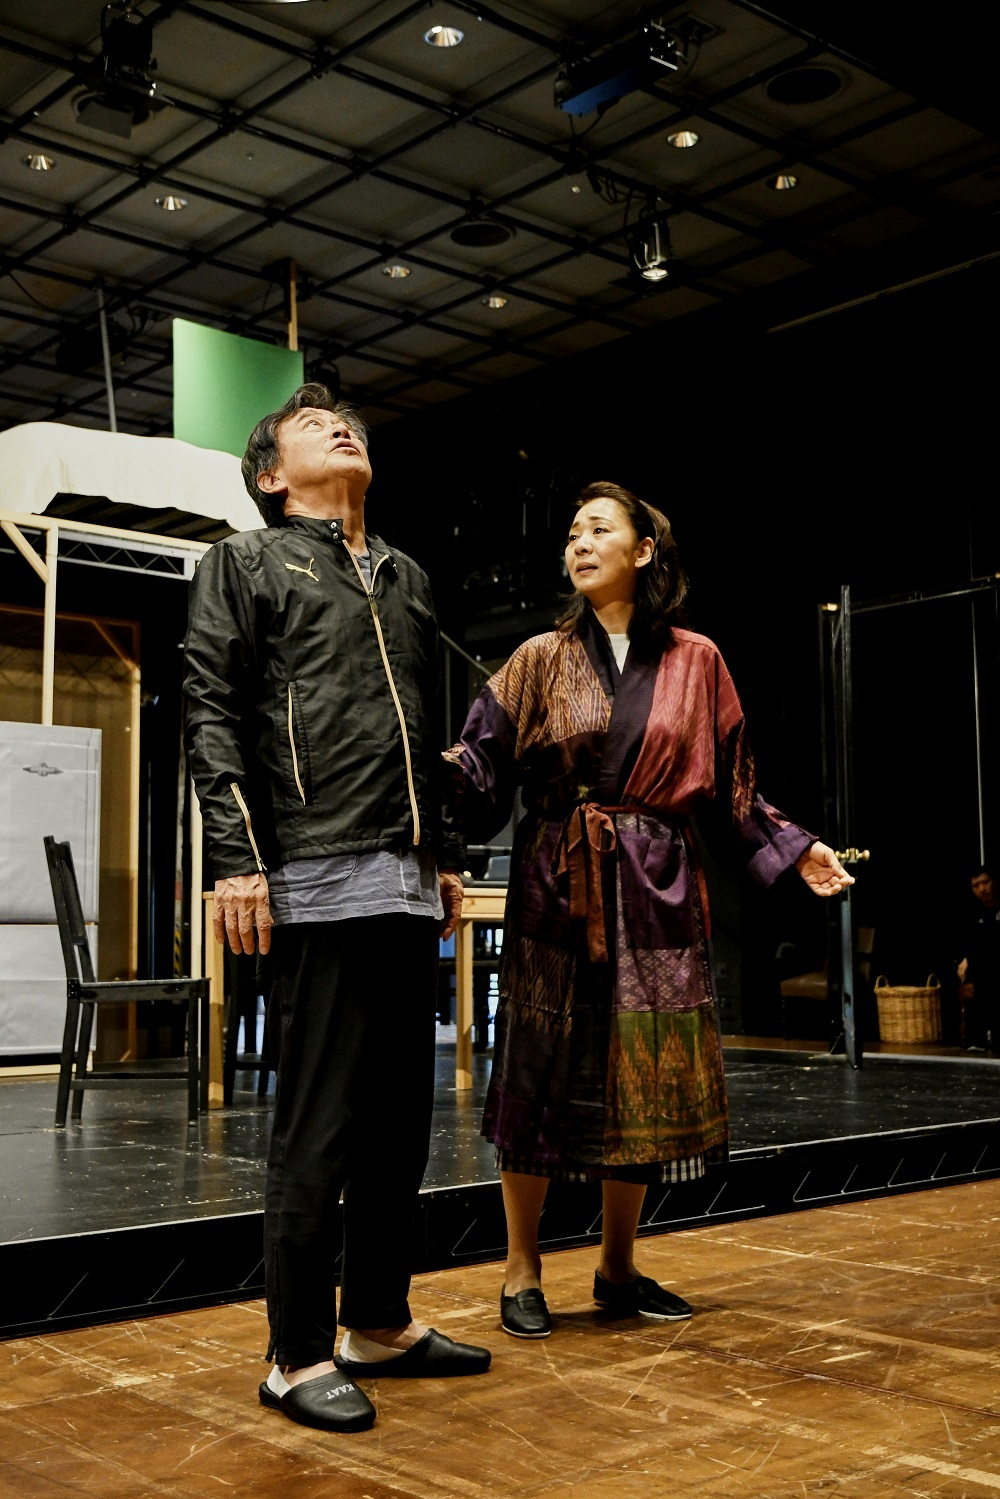 KAAT神奈川芸術劇場プロデュース『セールスマンの死』 撮影:細野晋司